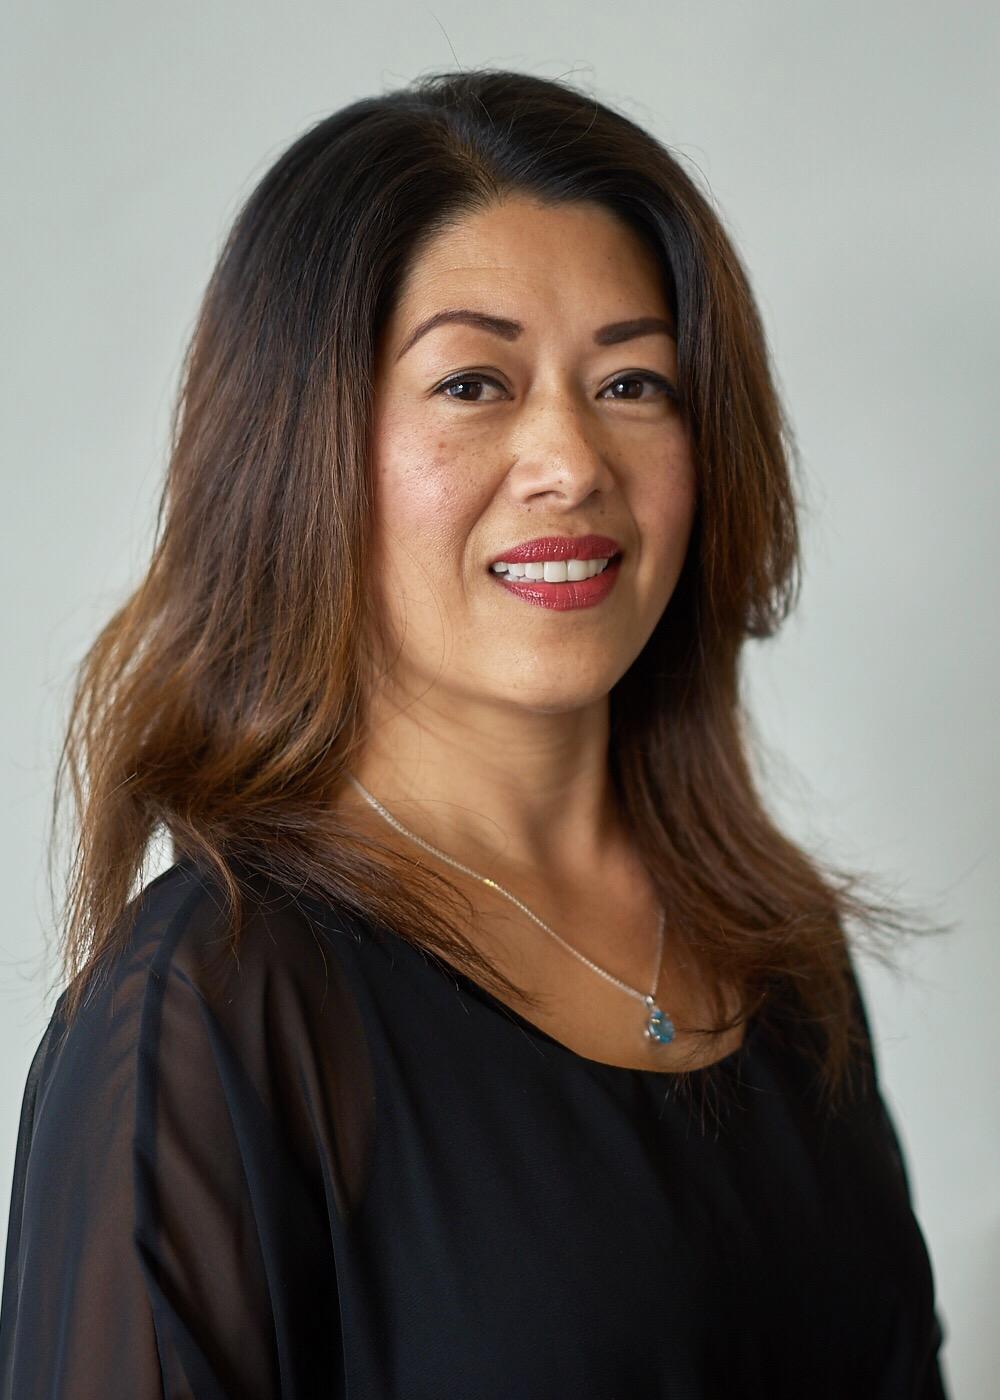 Meet Cheryl, a financial/treatment coordinator at Tanega Dental in South San Francisco.